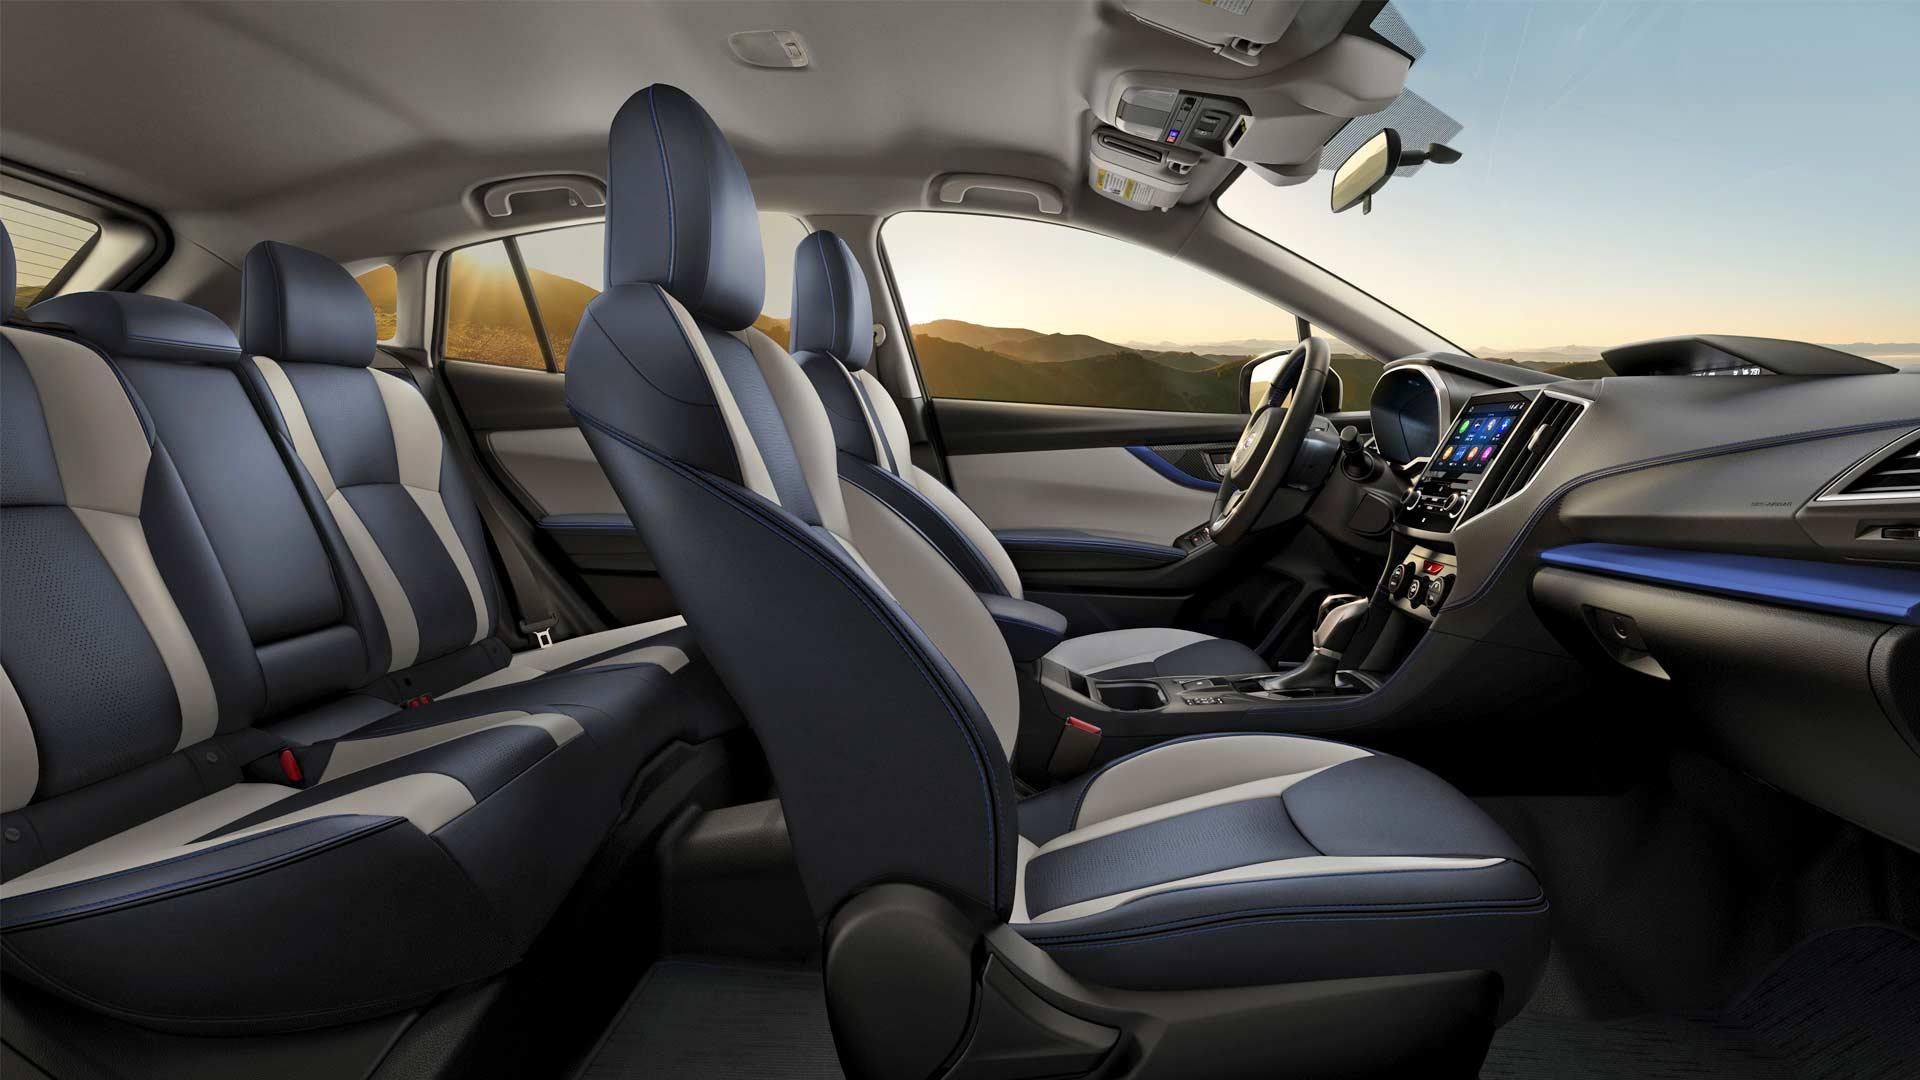 2019-Subaru-Crosstrek-Hybrid-Interior_6